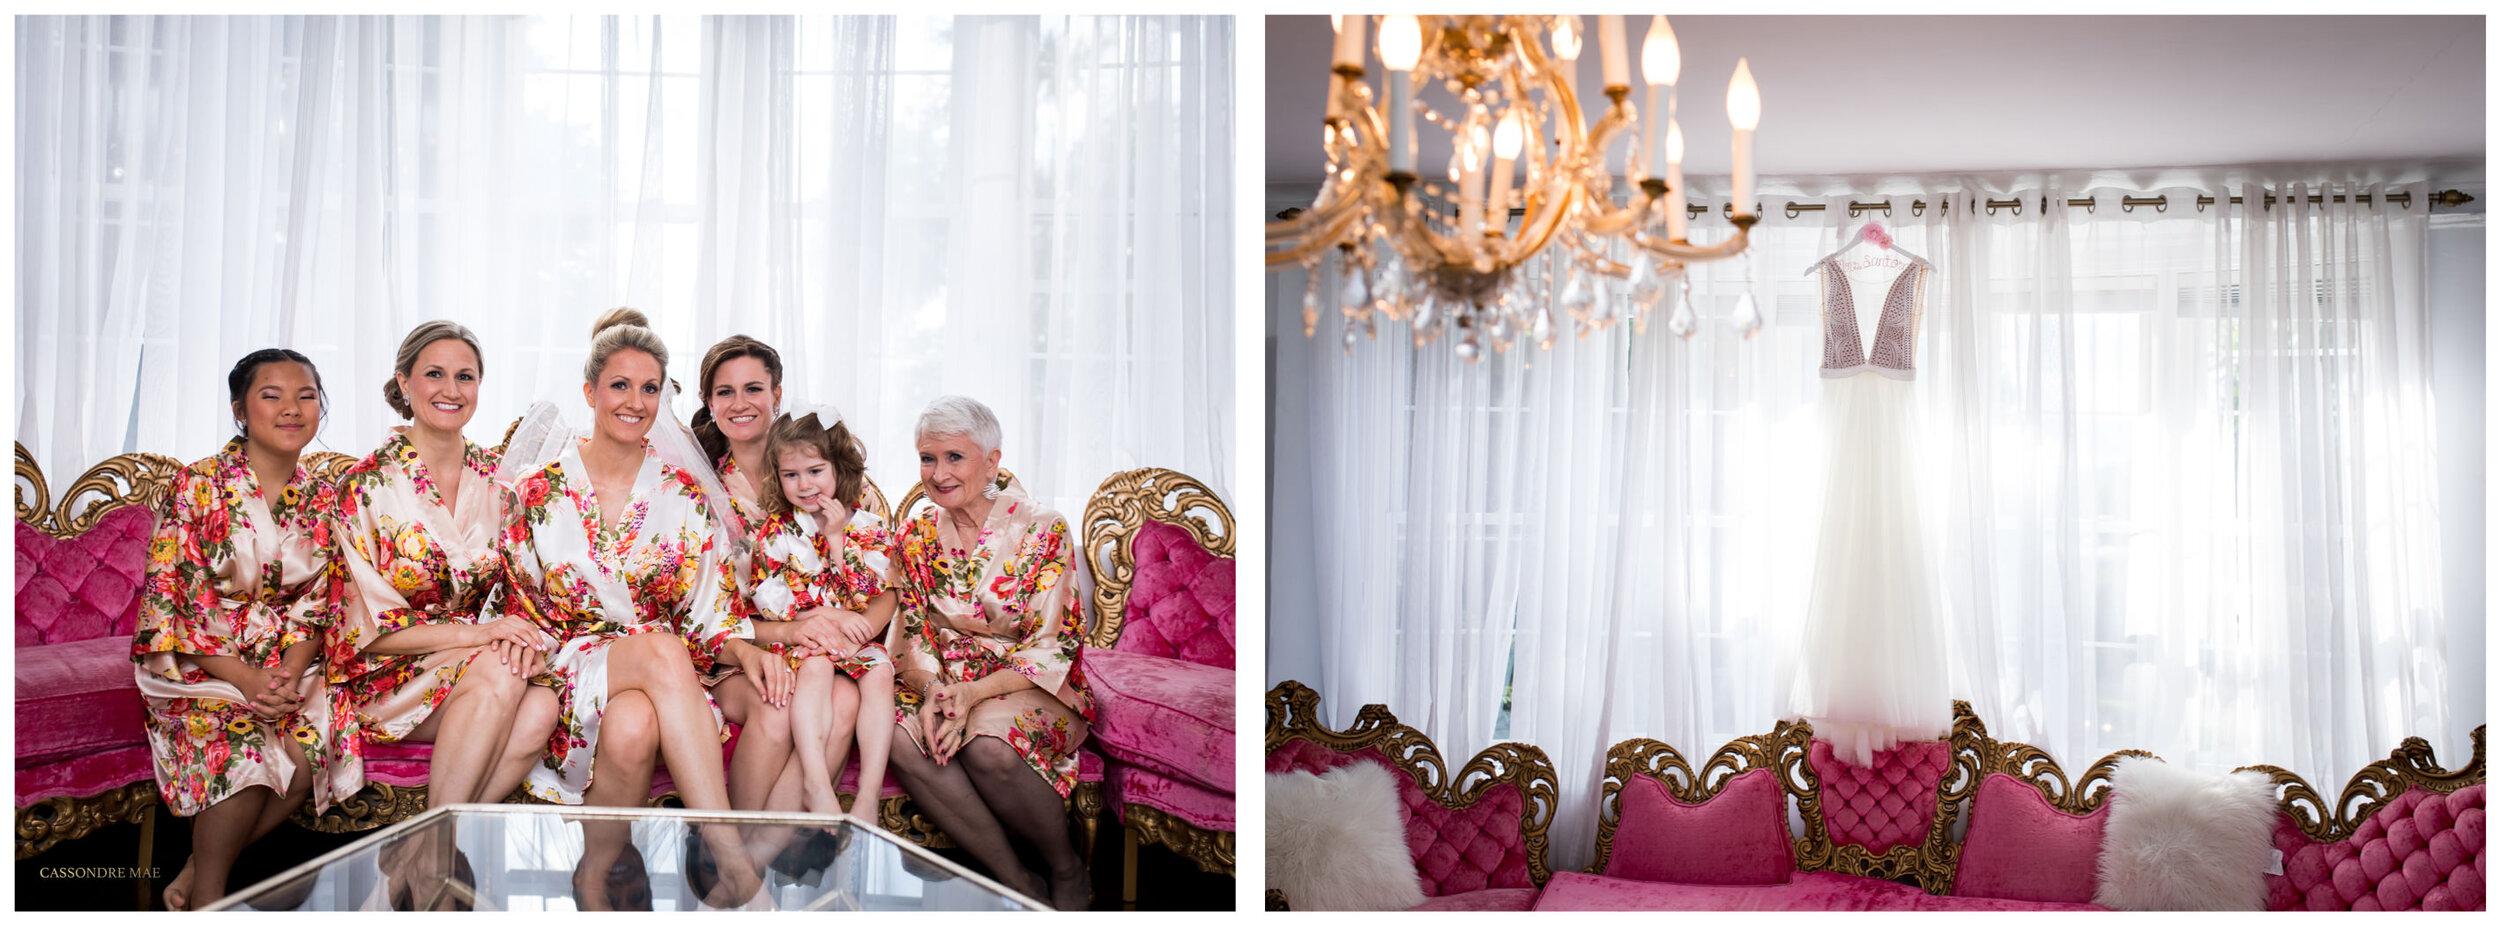 Cassondre Mae Photography Briarcliff Manor Wedding Photographer 17.jpg